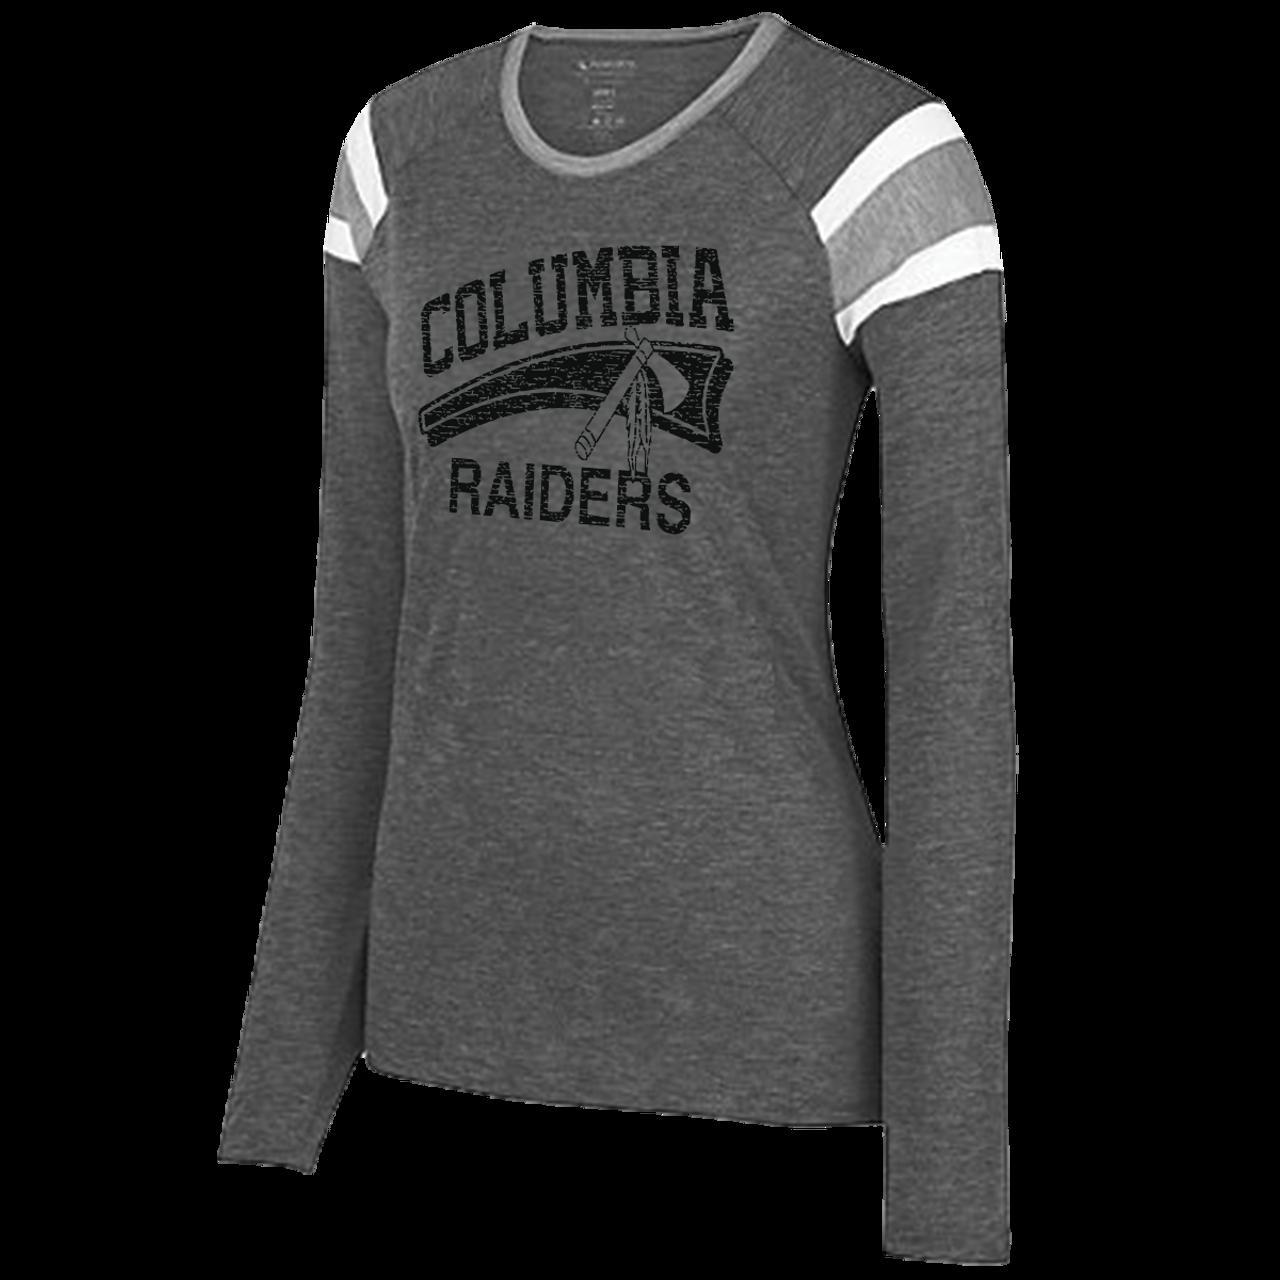 8d1793b9eb9f6 Columbia Raiders Ladies Fanatic LS Tee (F185) - RycoSports